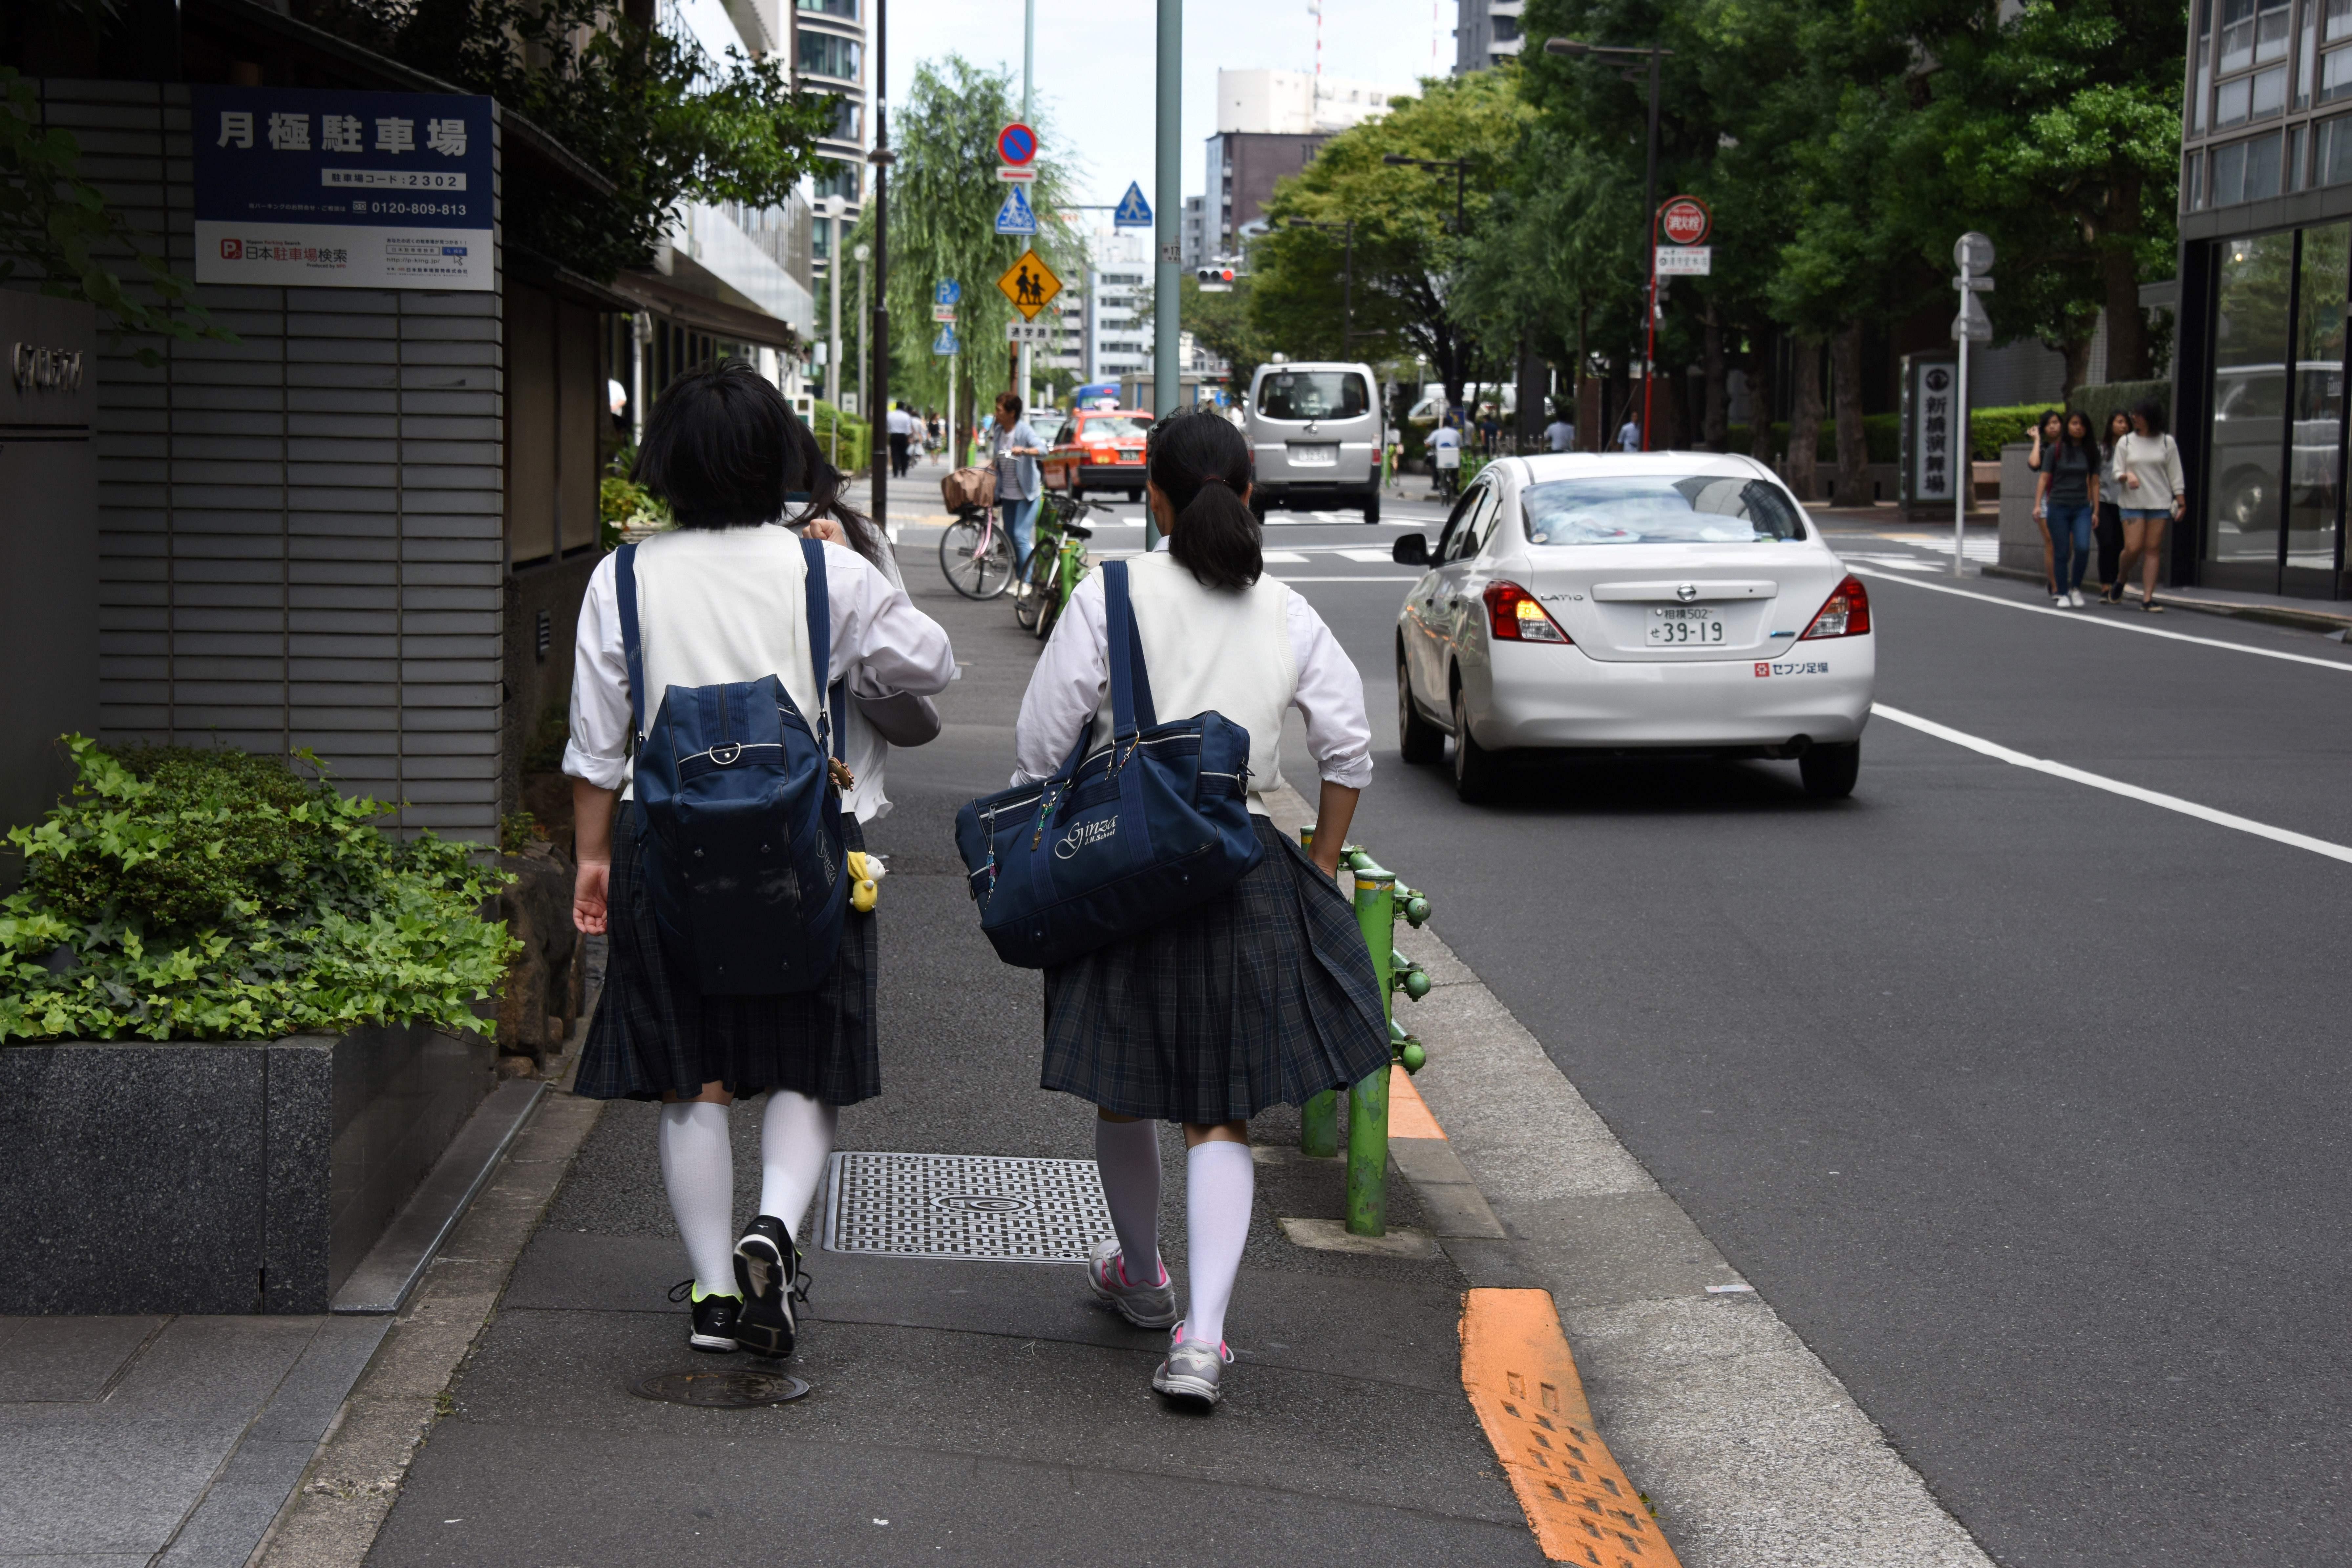 Japanese schoolgirls walk on a street in Tokyo on September 1, 2017.